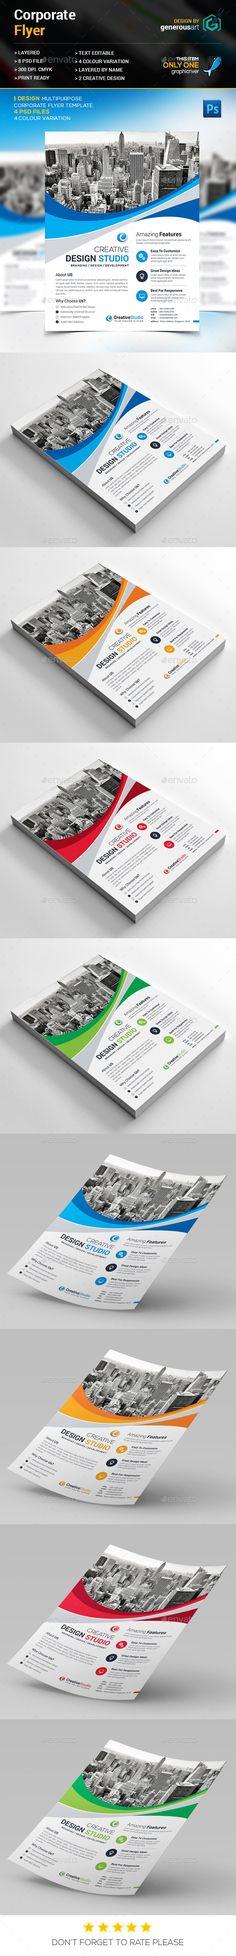 Business Flyer Template PSD #design #promote Download: http://graphicriver.net/item/business-flyer/13282982?ref=ksioks